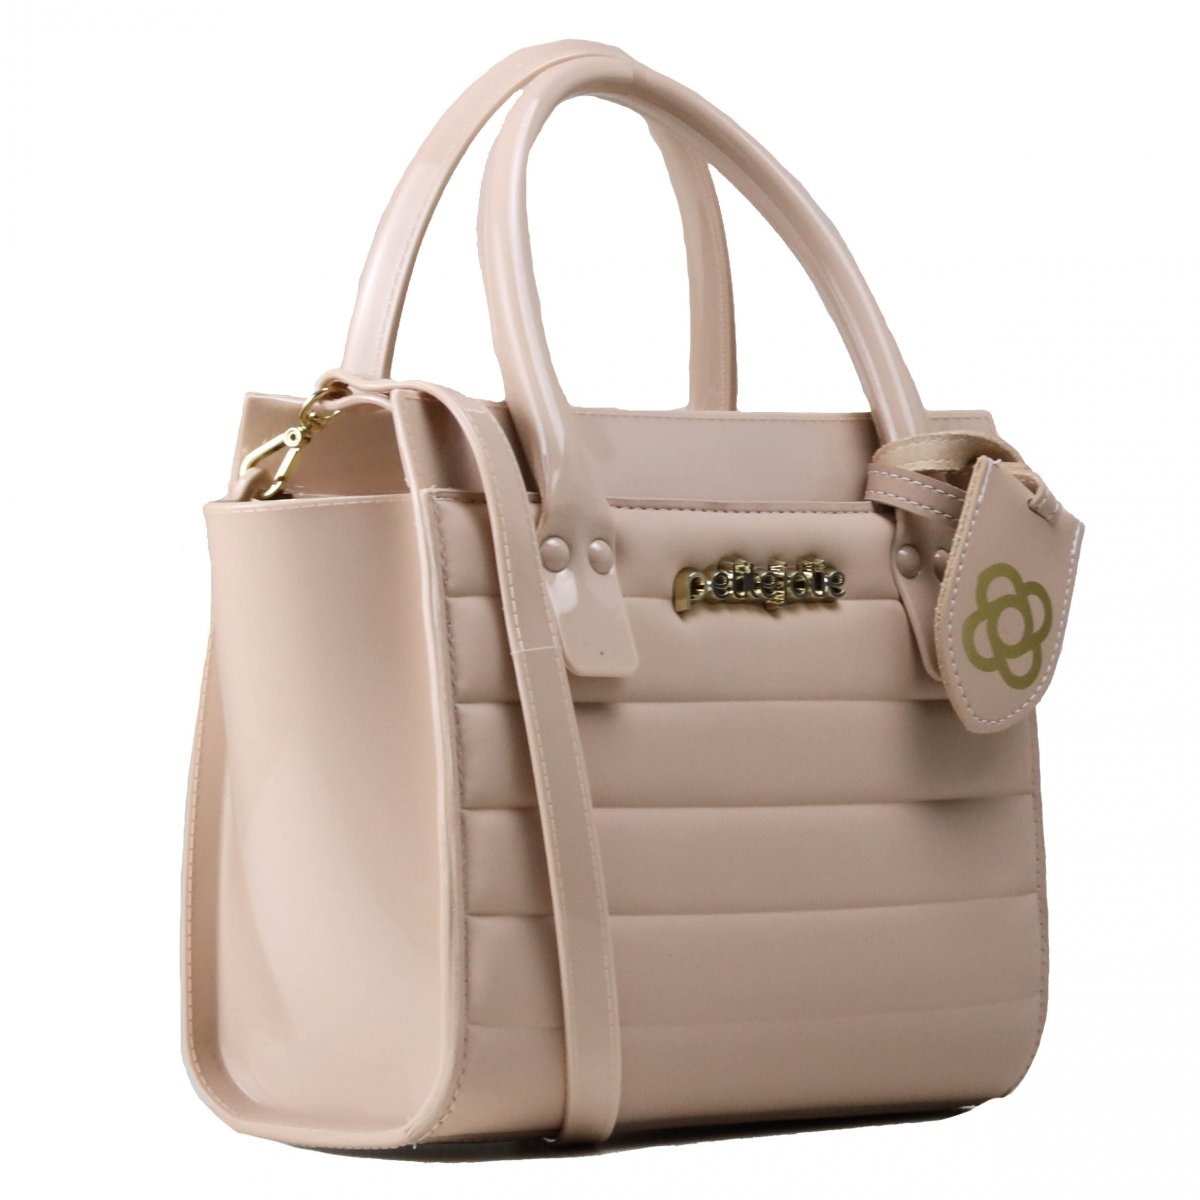 ca7dd5d525 bolsa petite jolie satchel casual rosa pj3597. Carregando zoom.